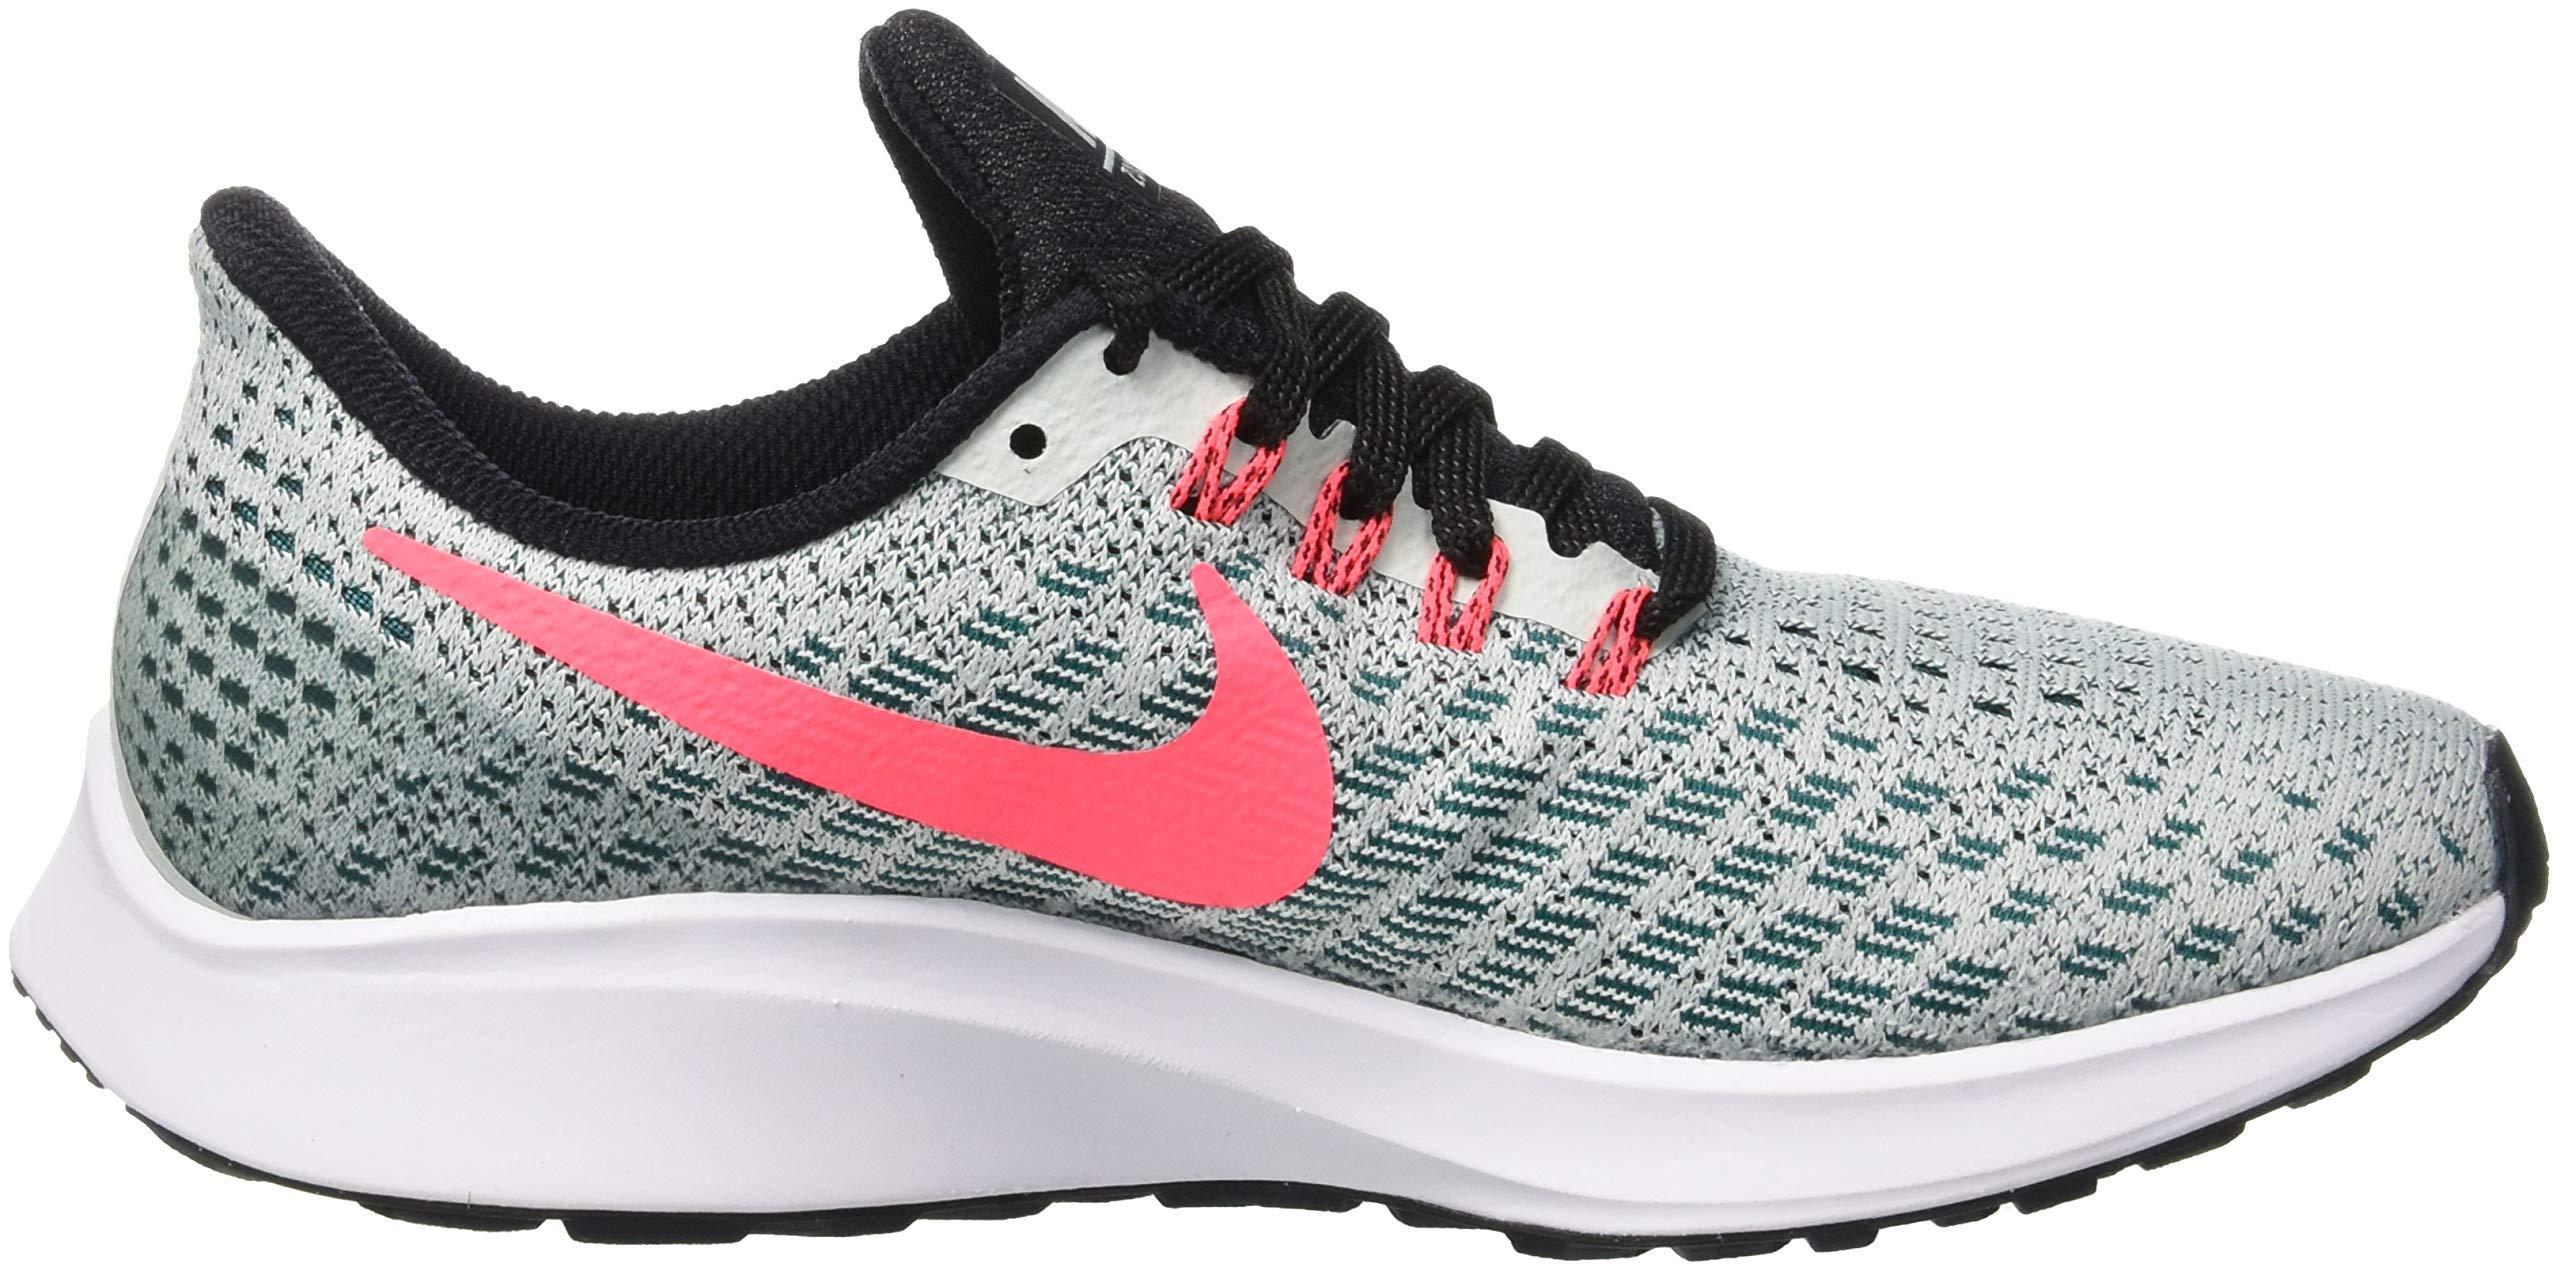 Nike Air Zoom Pegasus 35, Women's Running, Multicolored (Barely Grey/Hot Punch/Geode Teal/Black 009), 4 UK (EU) by Nike (Image #7)